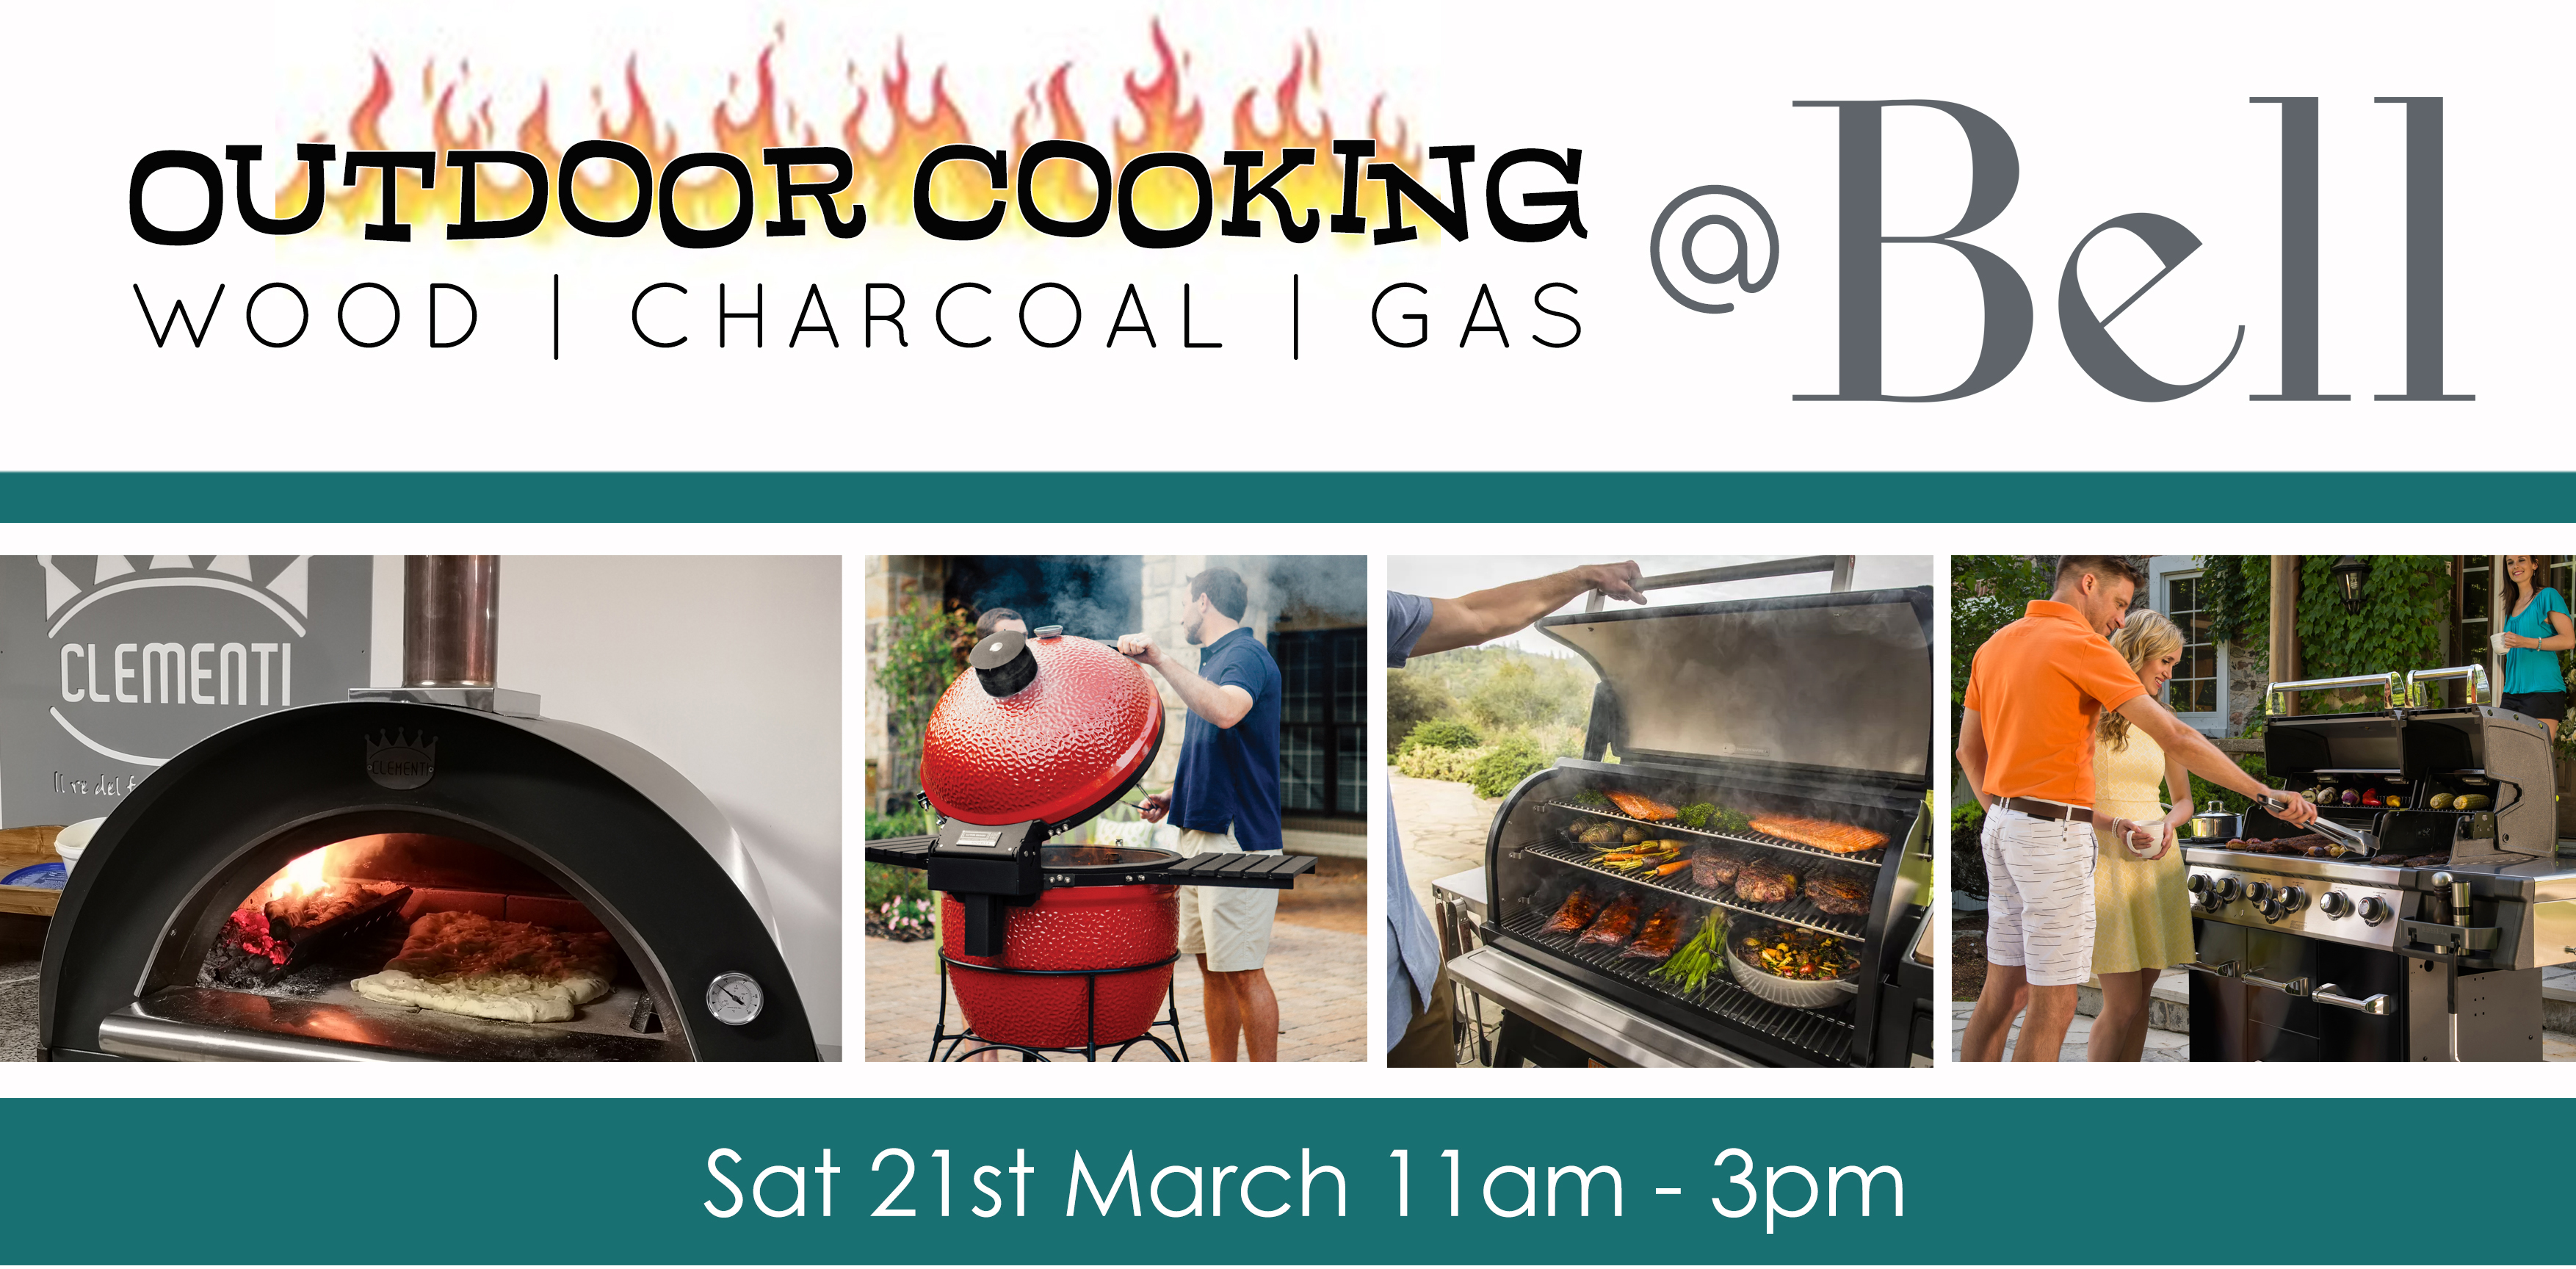 outdoor cooking flames sat 21st march, 11am til 3pm